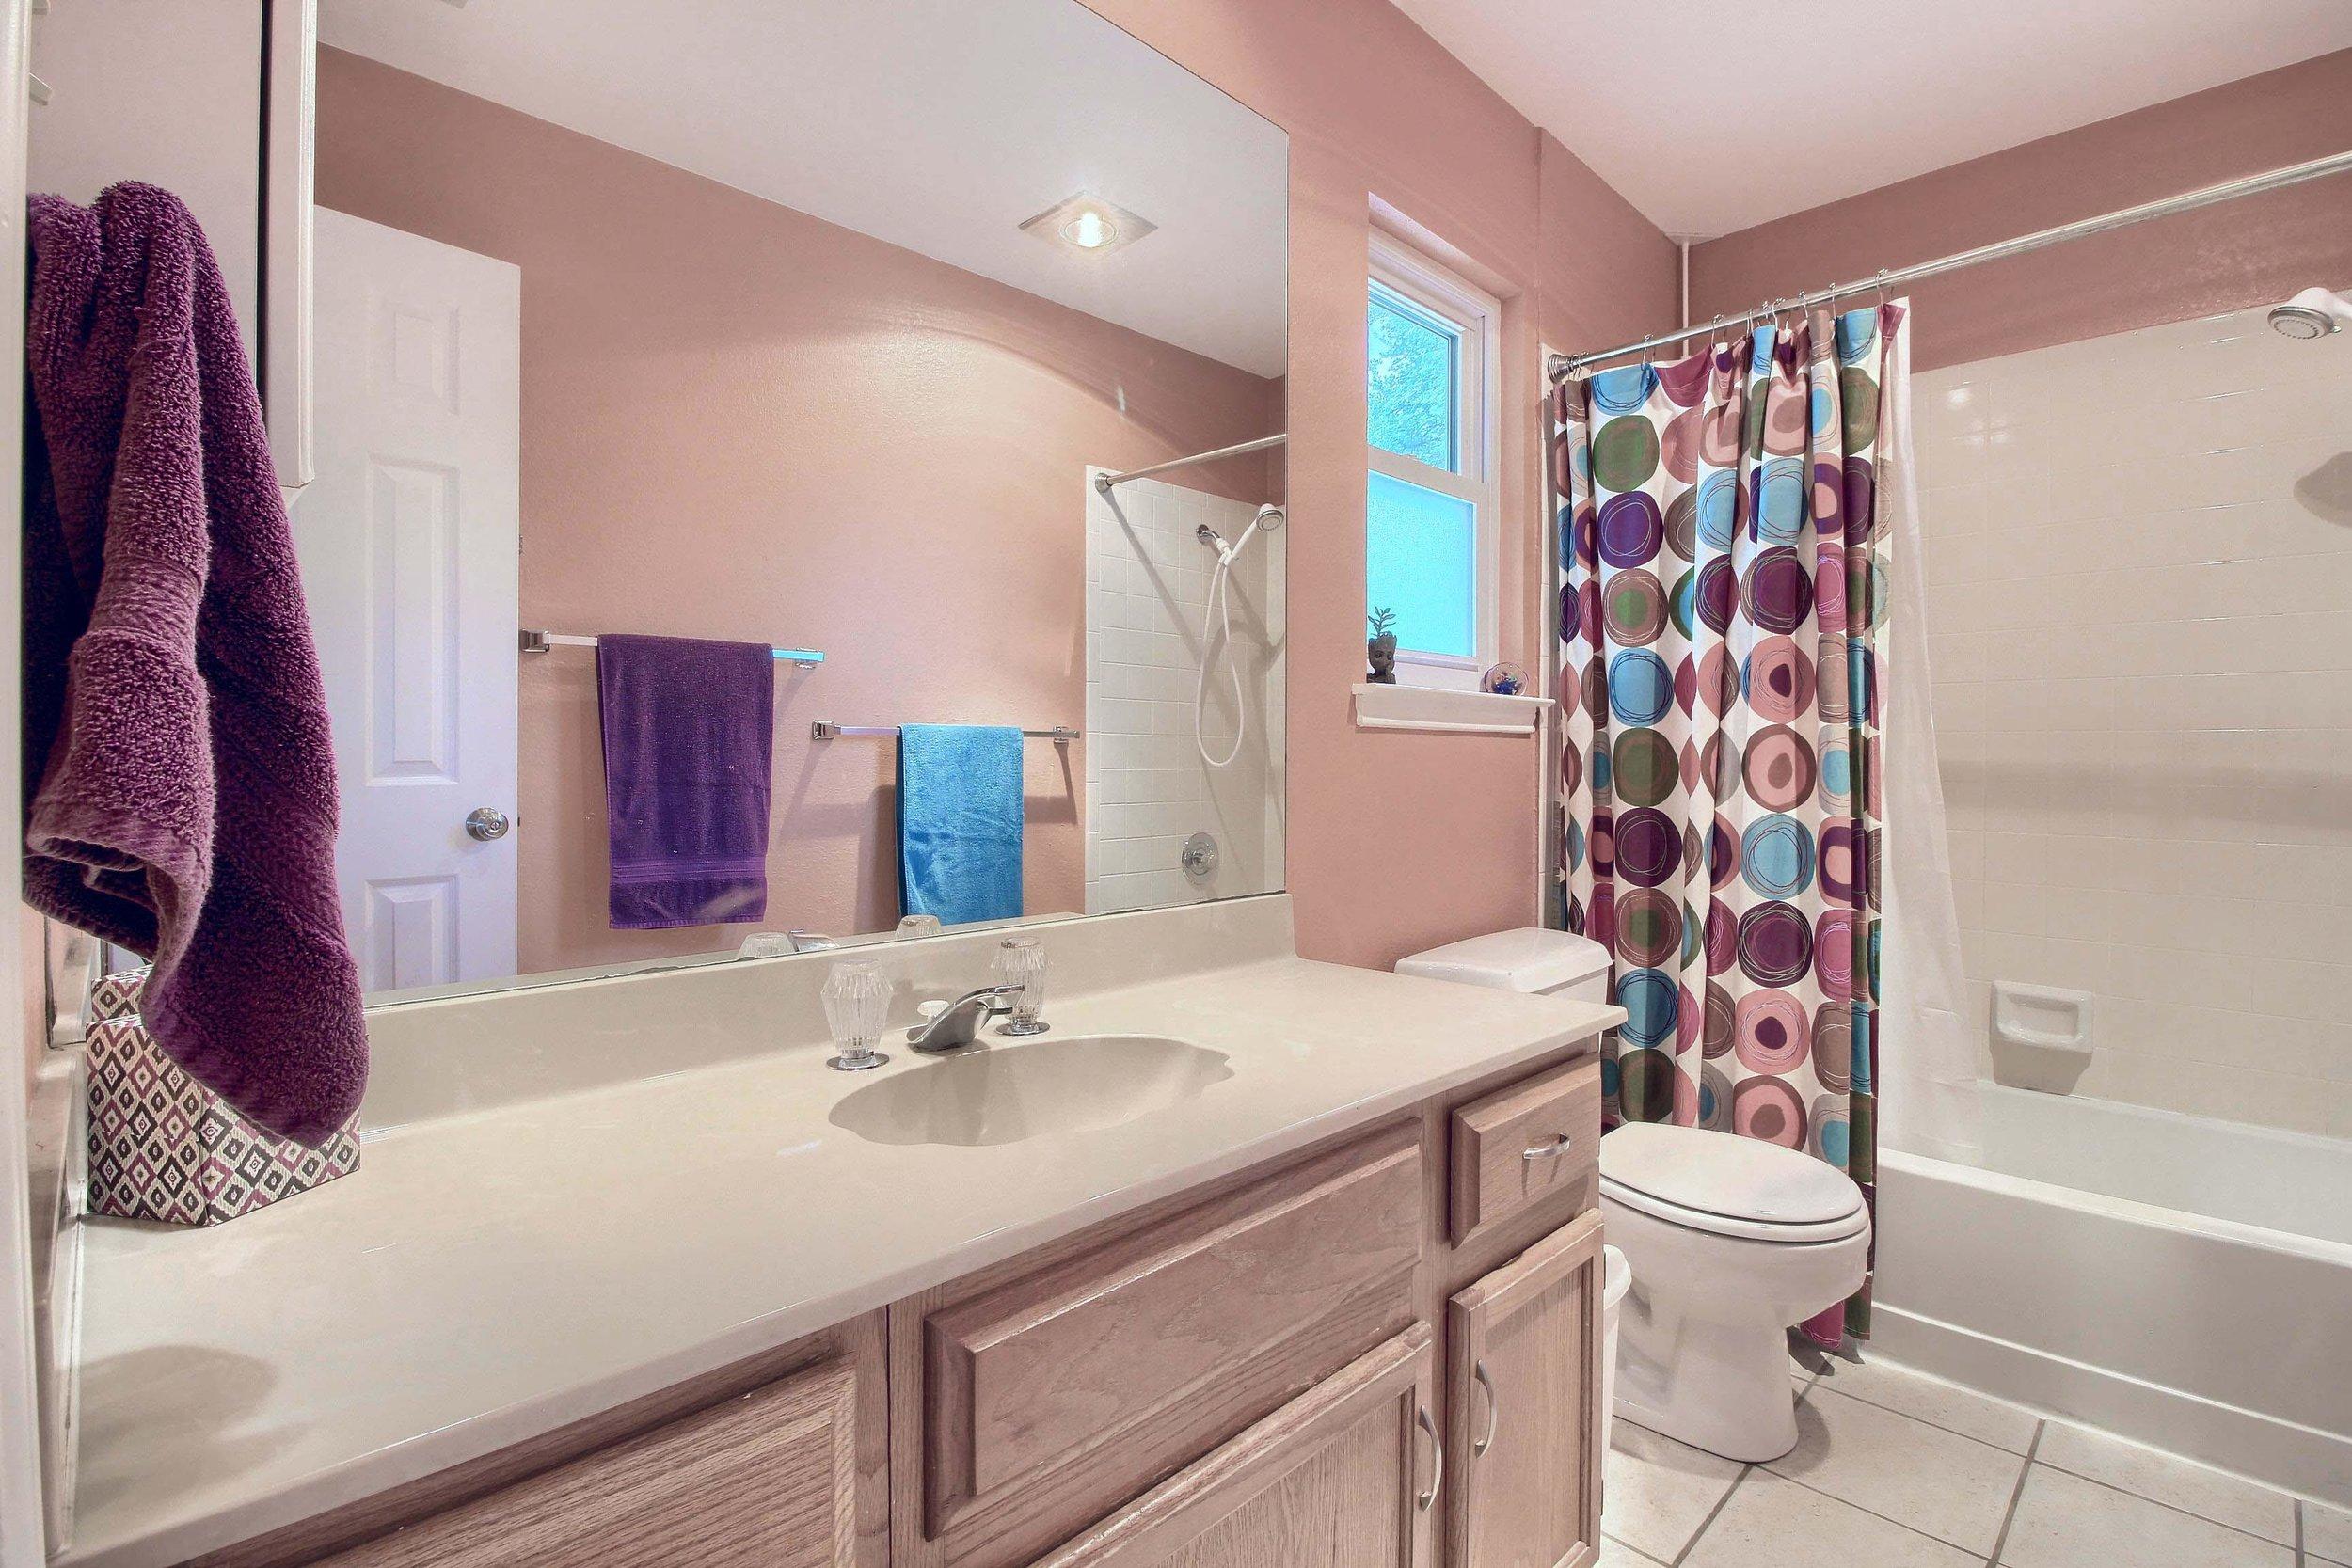 07_Bathroom_IMG_7976.JPG